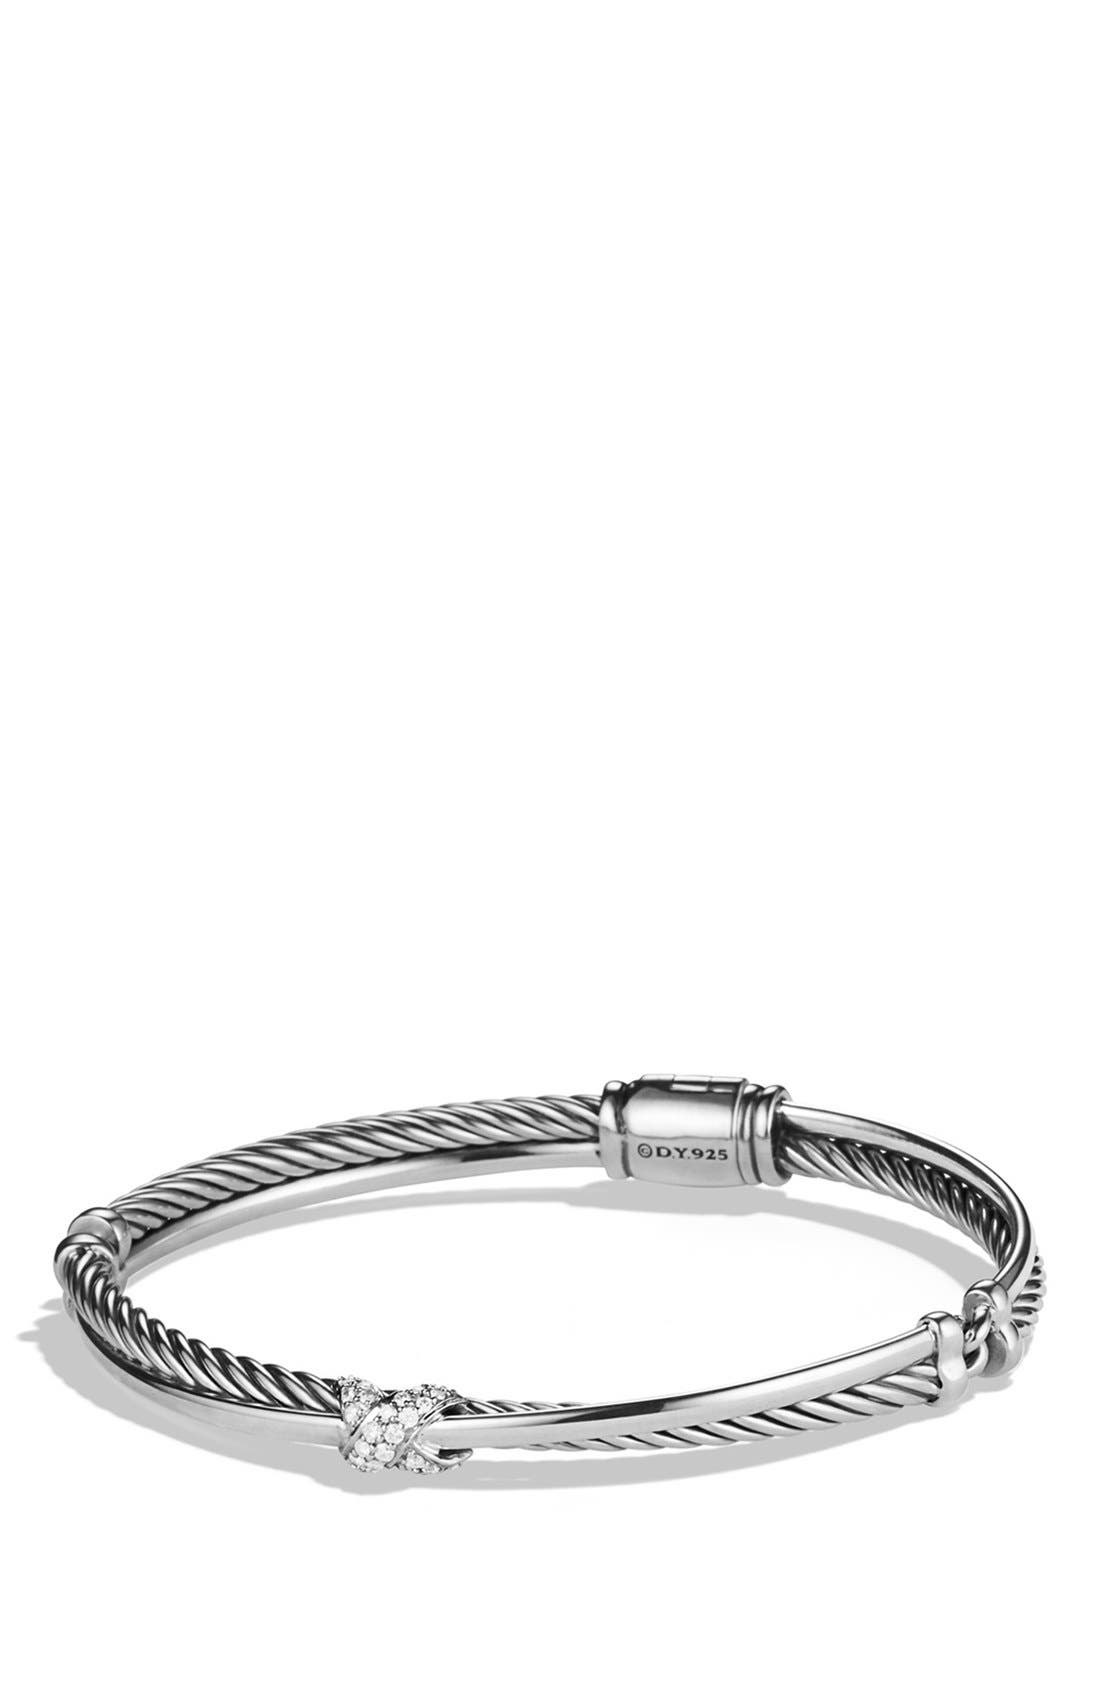 Alternate Image 1 Selected - David Yurman Petite 'X' Crossover Bracelet with Diamonds